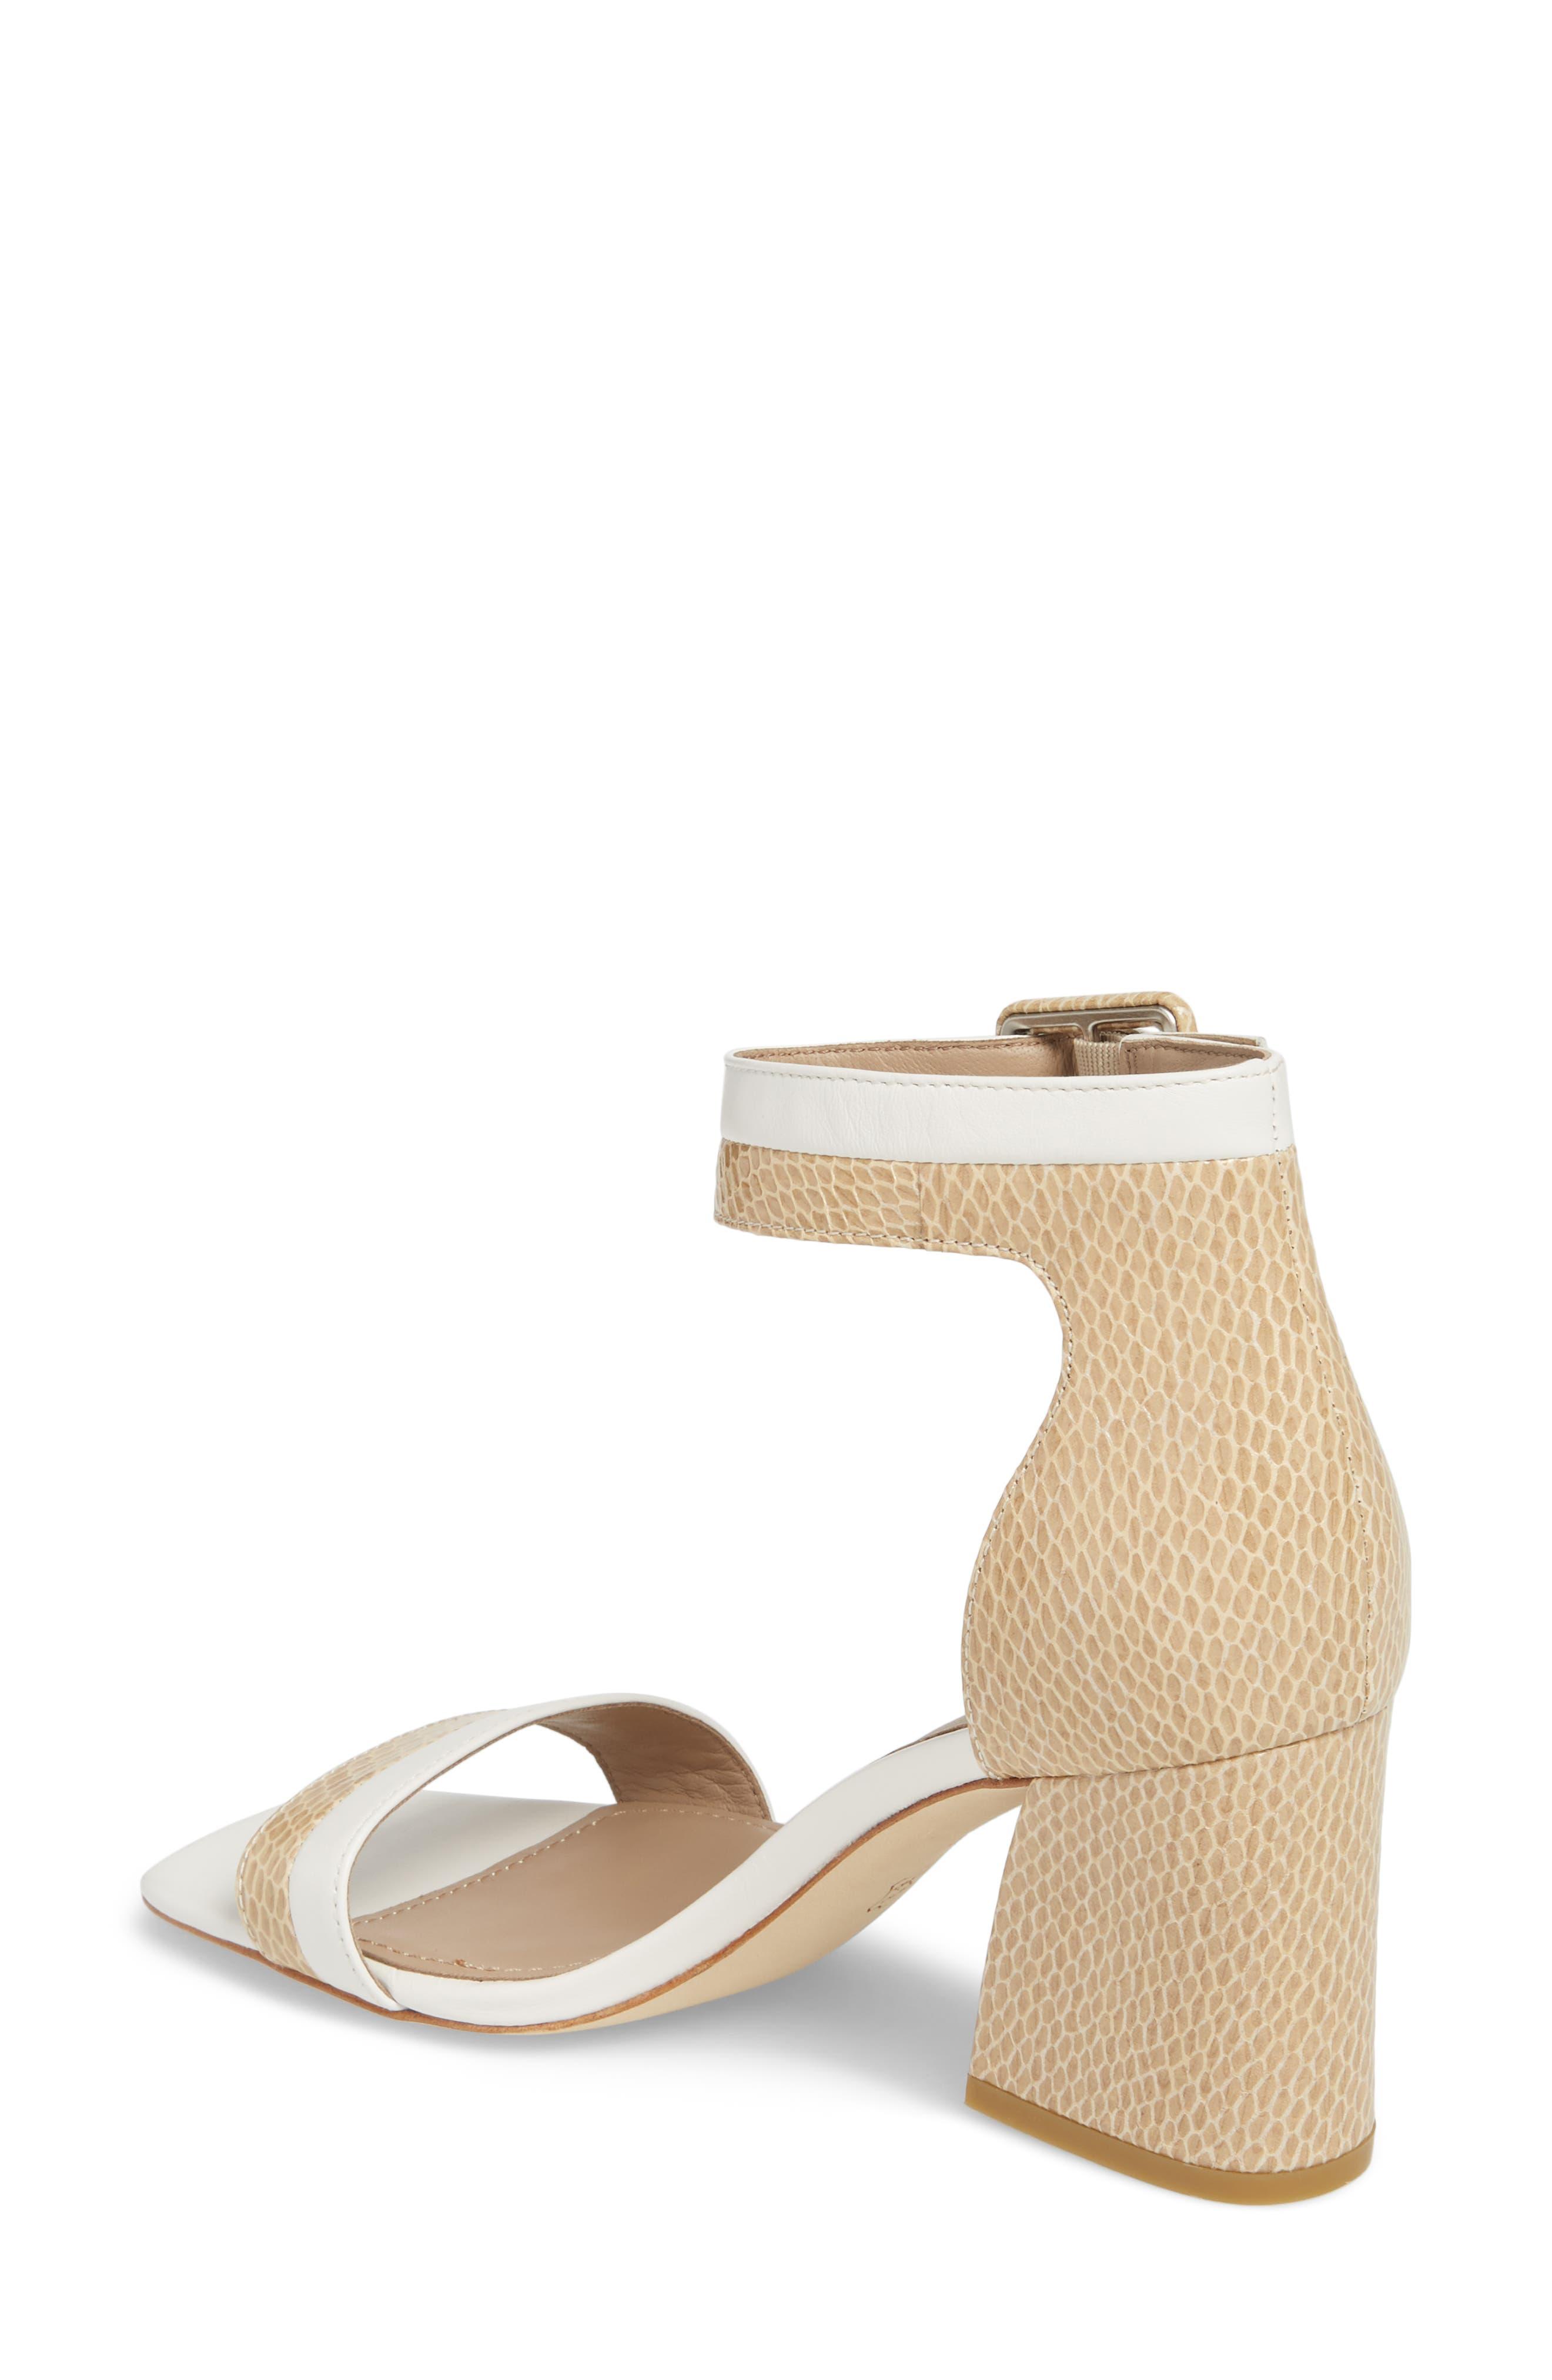 DONALD PLINER,                             Watson Ankle Strap Sandal,                             Alternate thumbnail 2, color,                             250